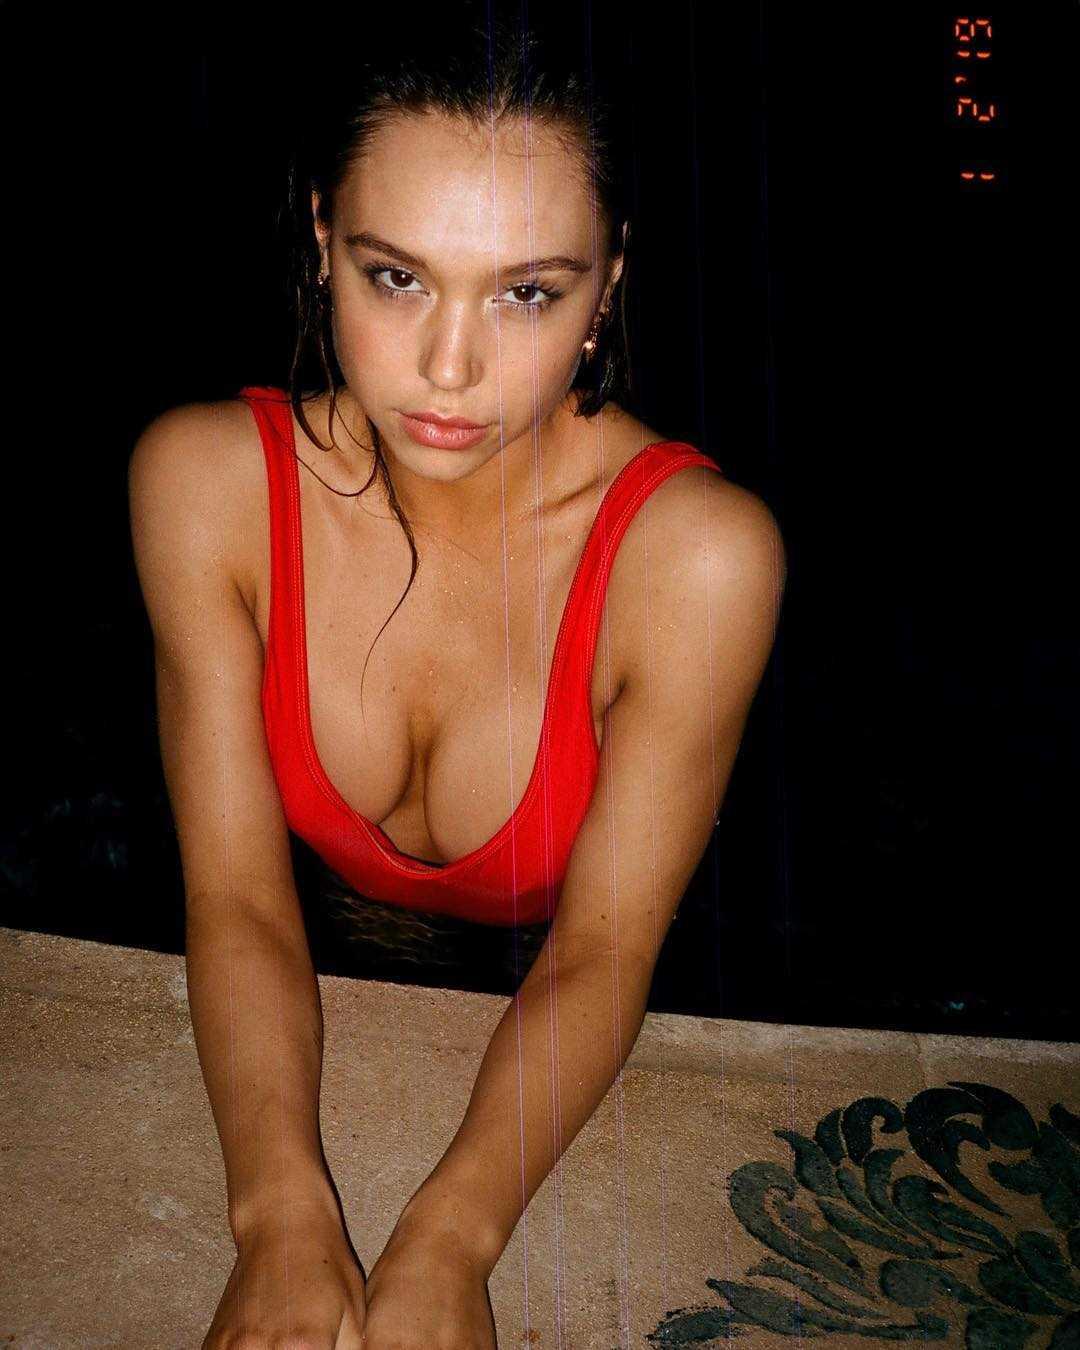 Alexis Ren hot cleavage pics